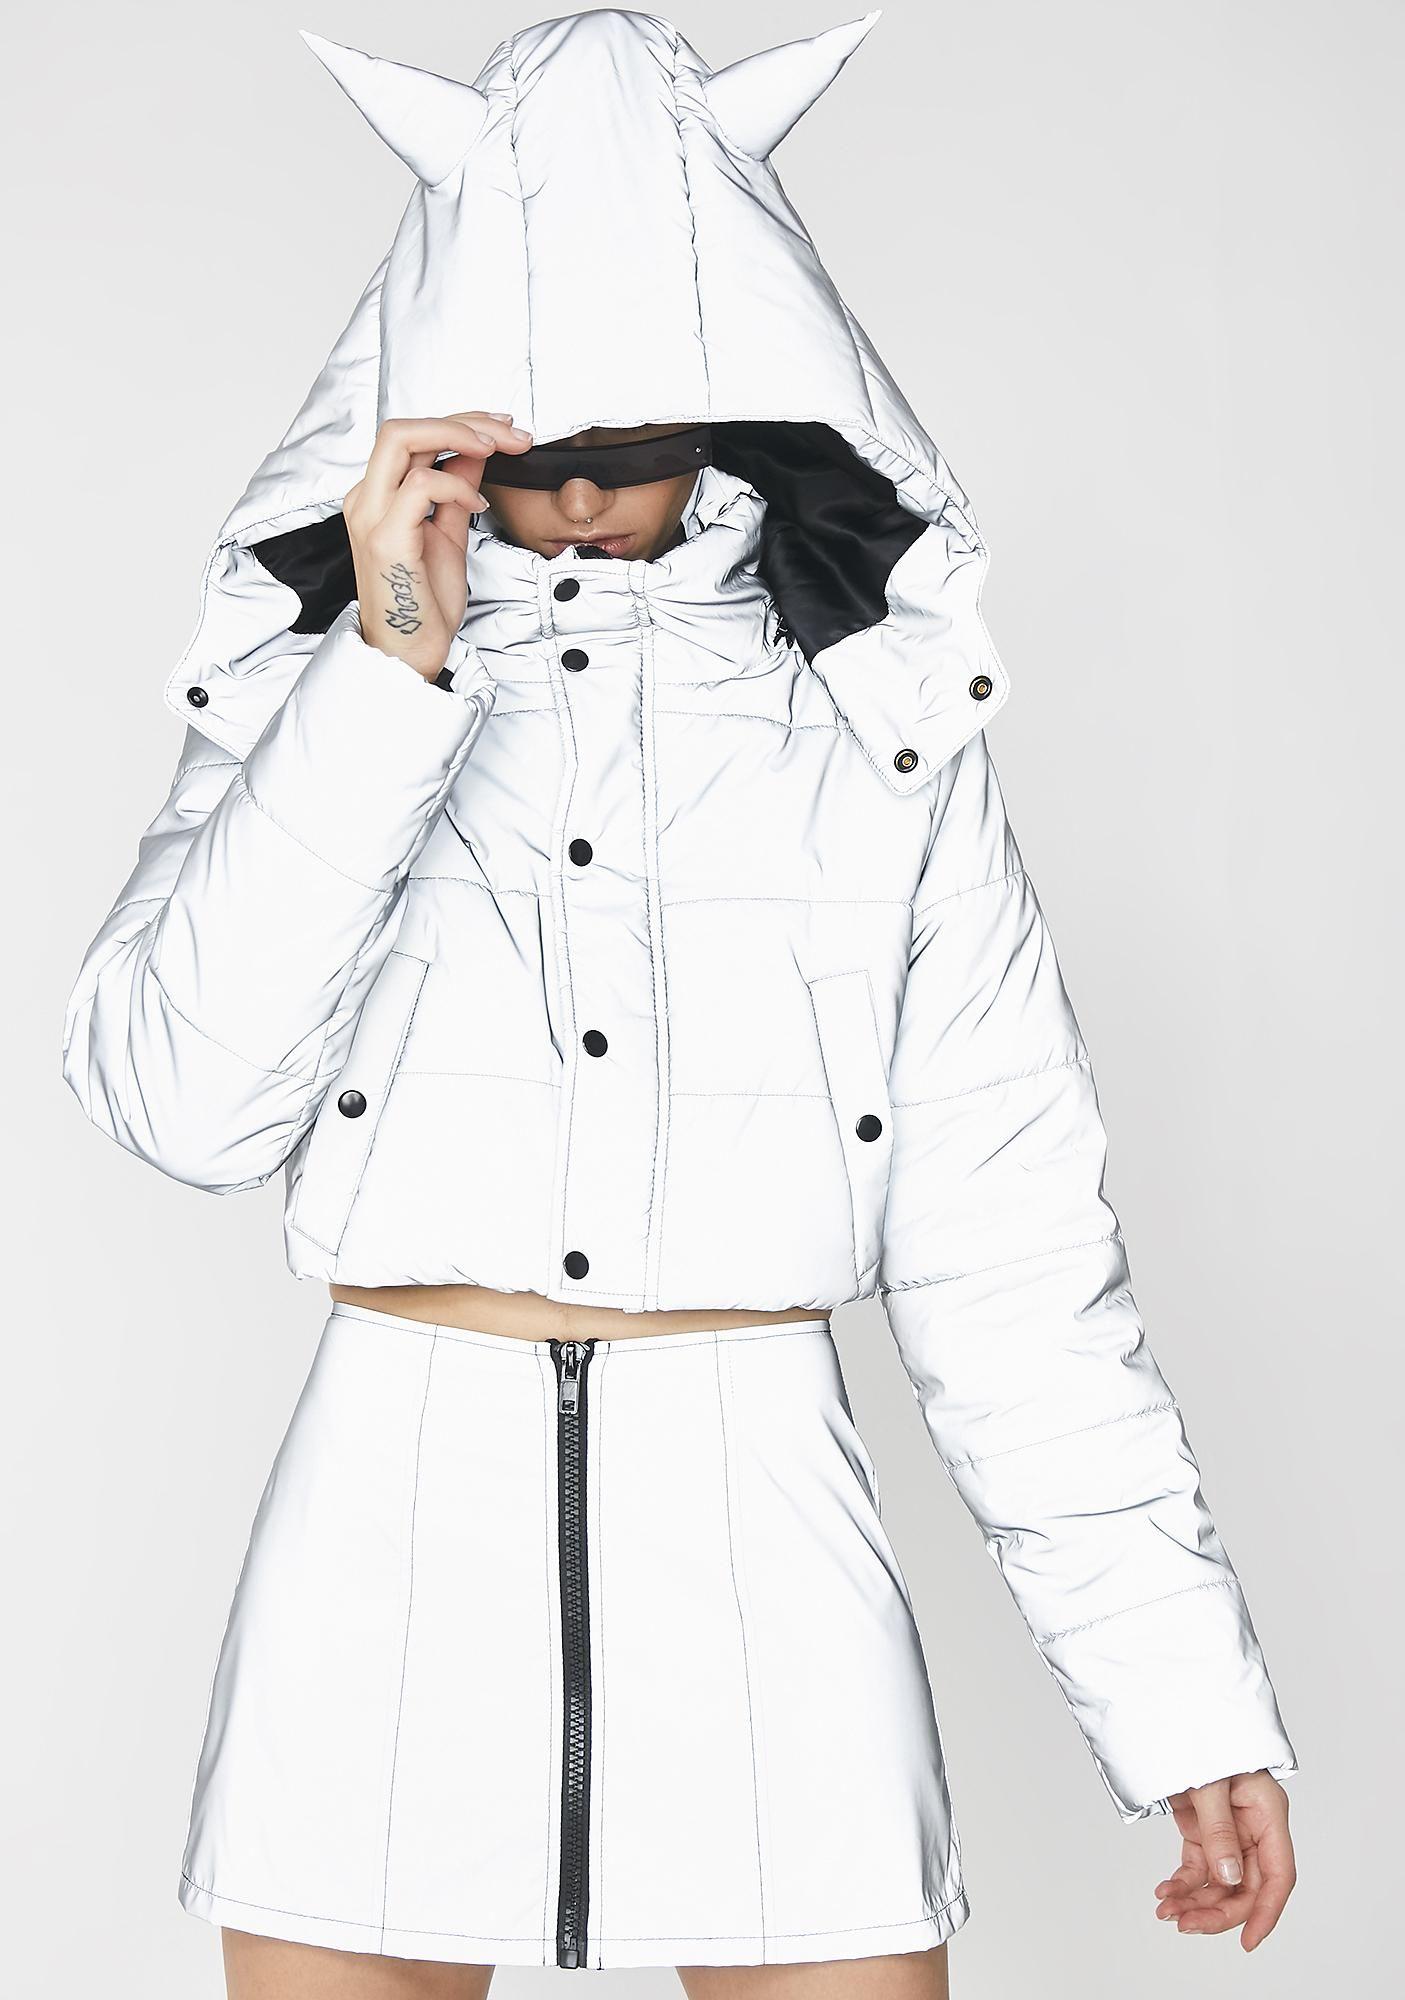 4b6dddafe5f40 Club Exx Savage Signalz Reflective Jacket